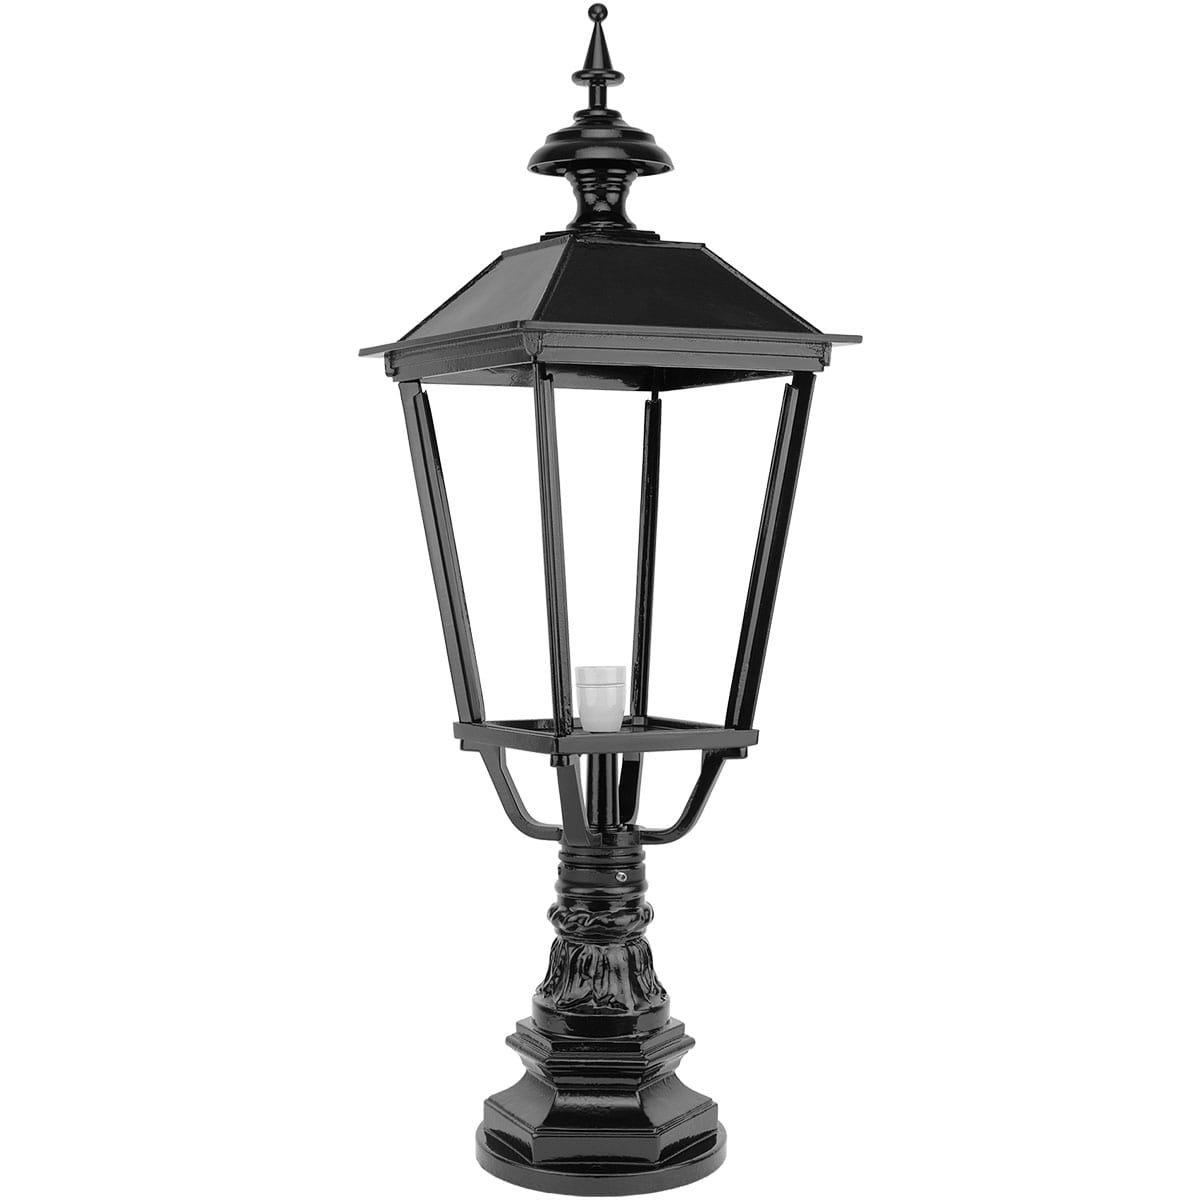 Outdoor Lighting Classic Rural Garden lantern big Besoyen - 106 cm